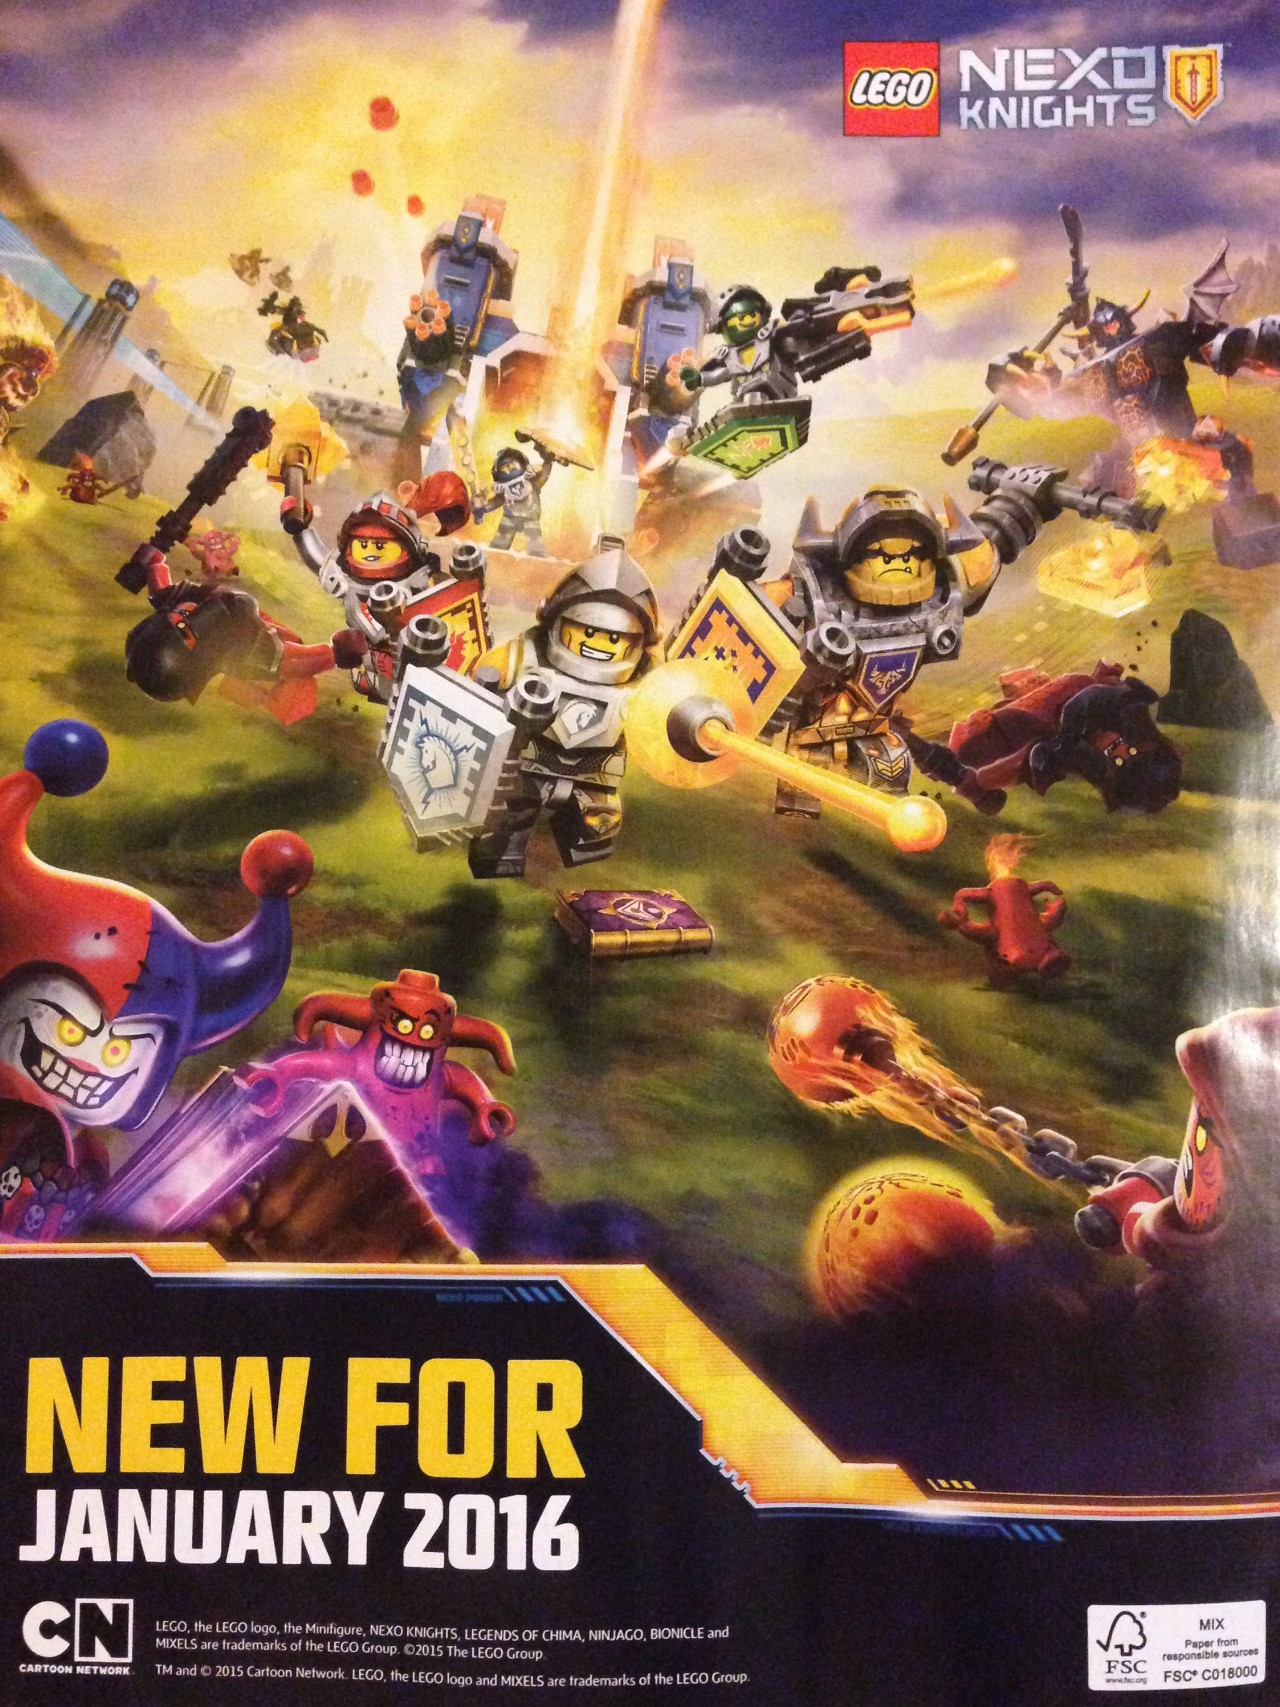 Lego nexo knights tv programm heute 2015 - 7f